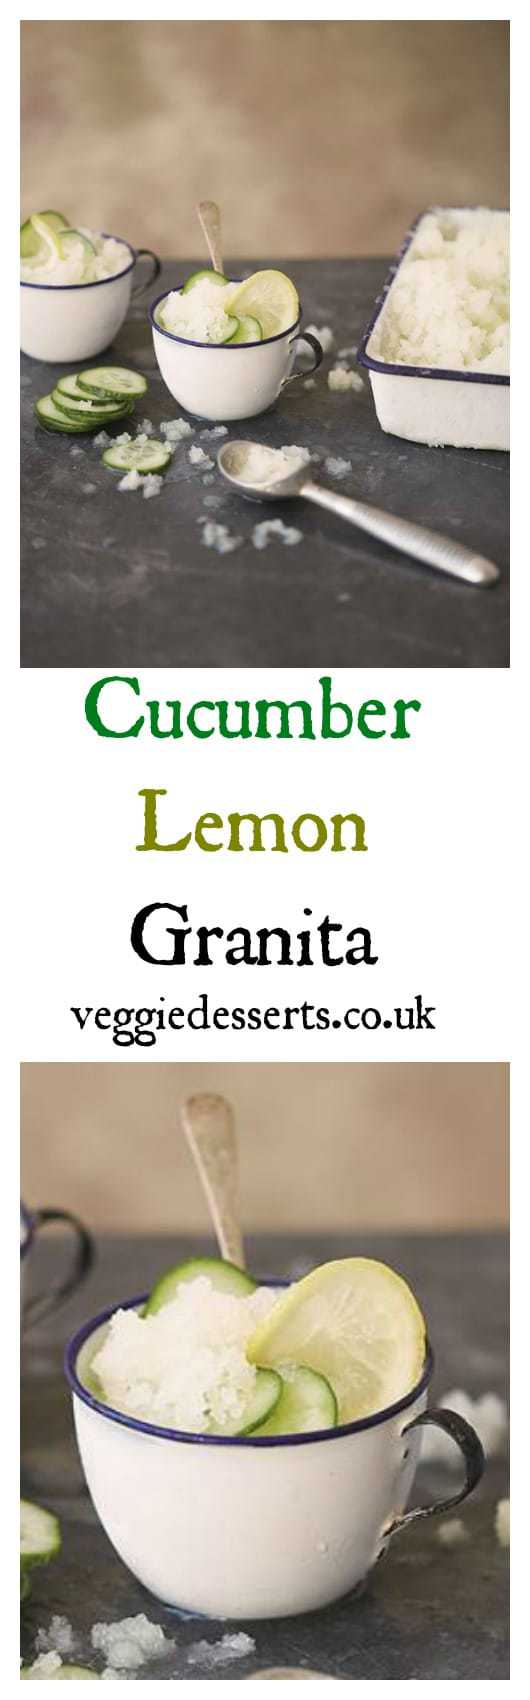 Cucumber Lemon Granita | From Veggie Desserts and Cakes by Kate Hackworthy